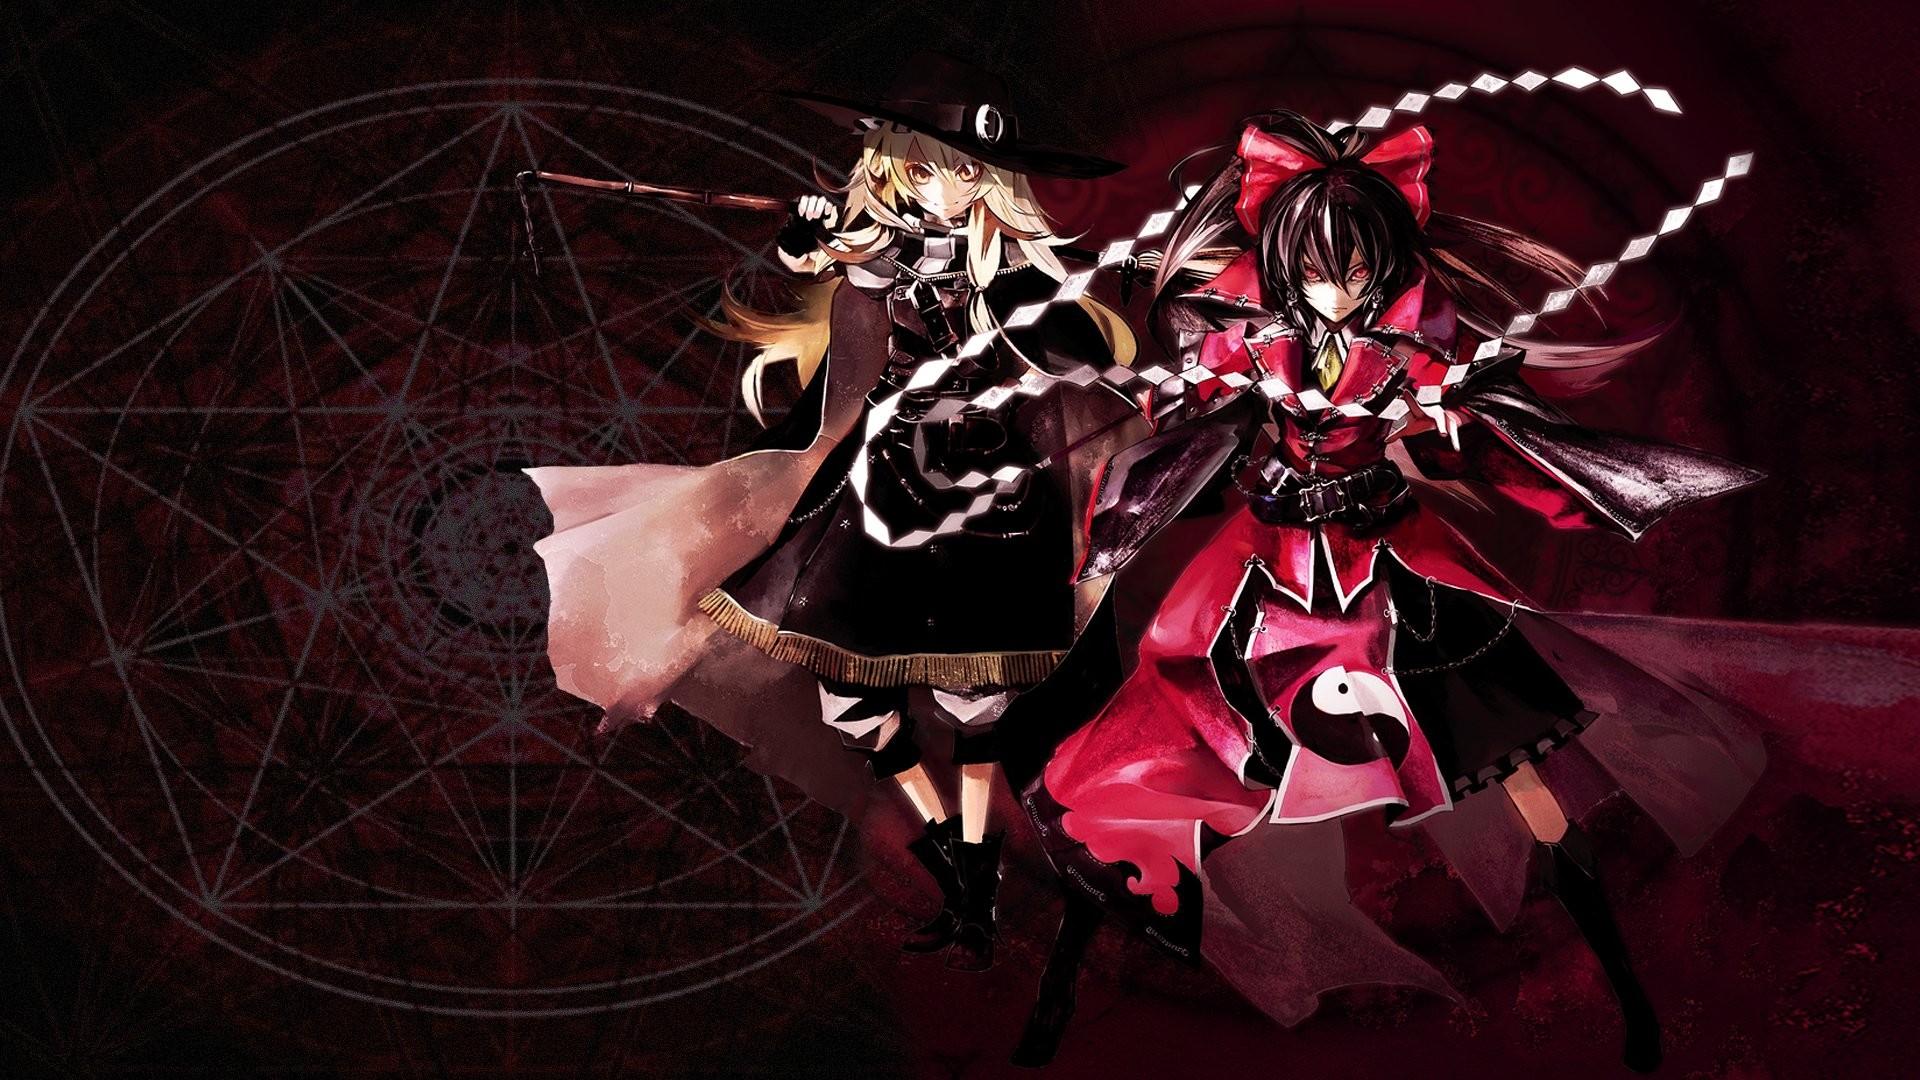 Anime – Touhou Reimu Hakurei Marisa Kirisame Wallpaper